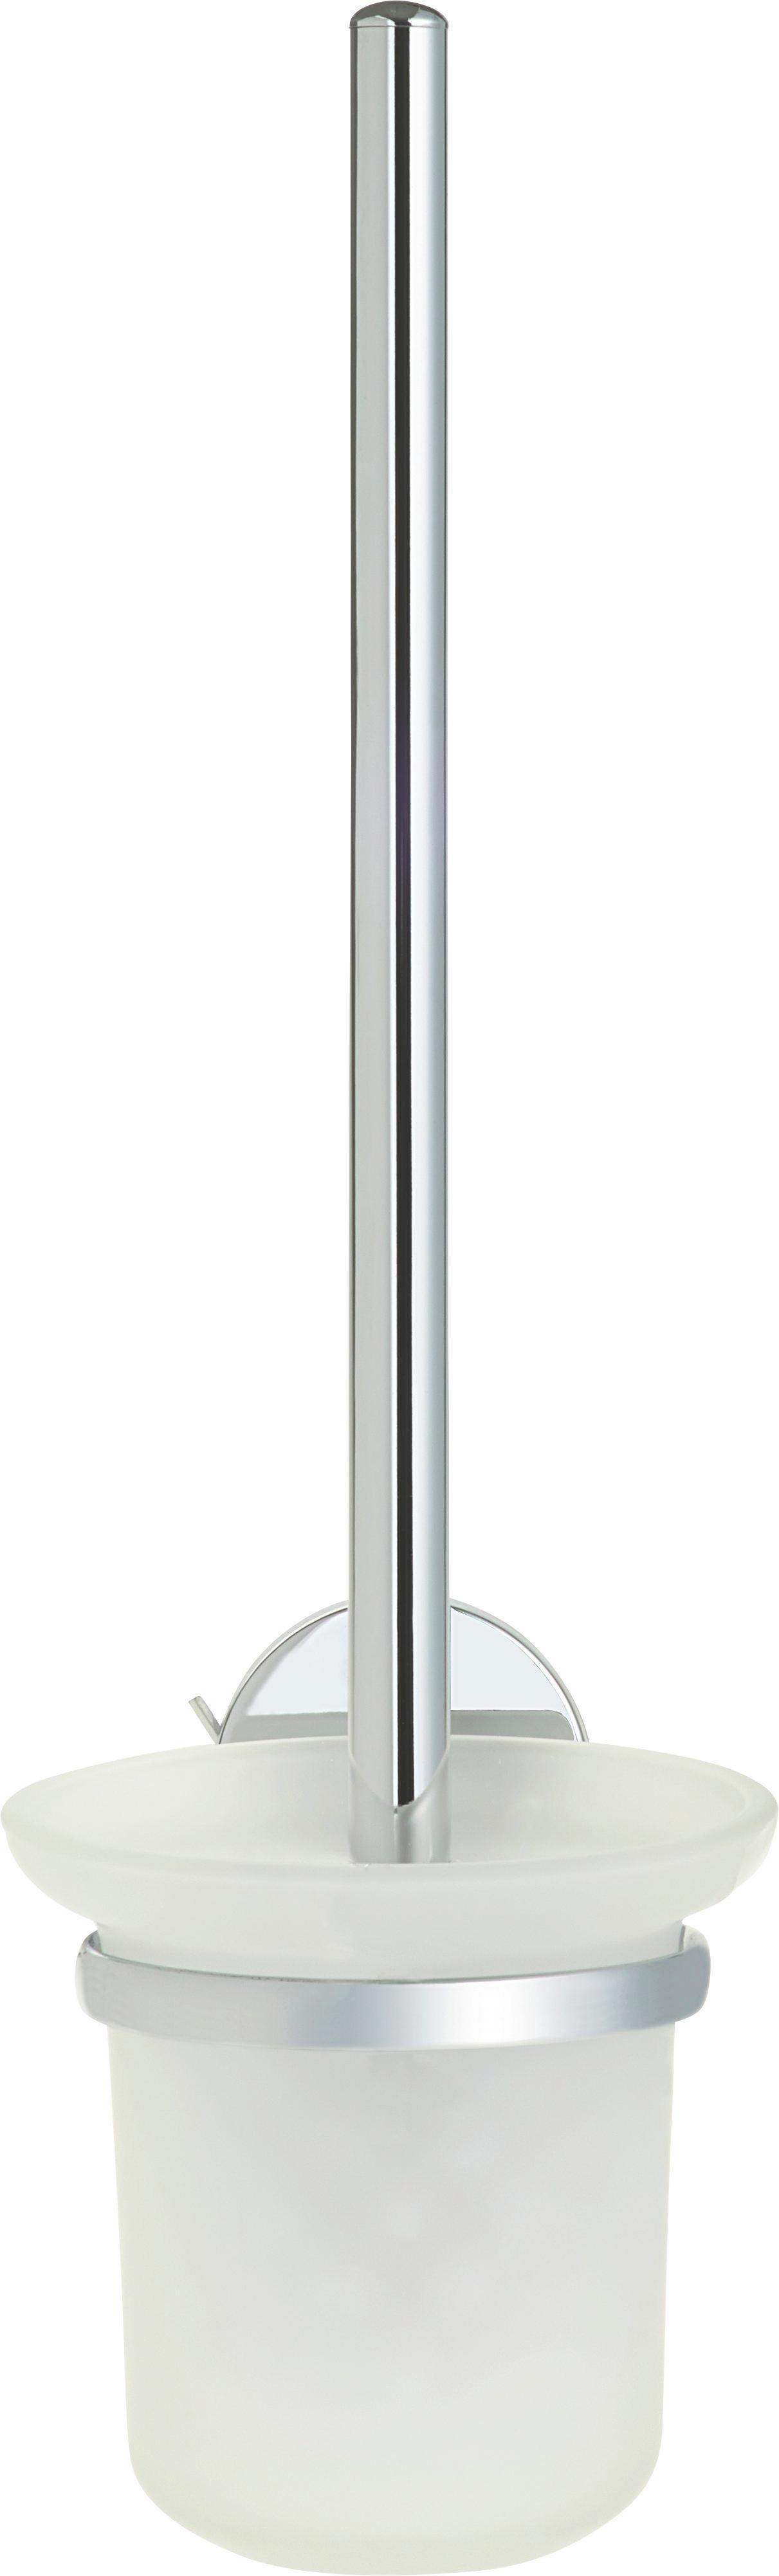 WC-Bürstengarnitur Vision in Chrom aus Glas - Chromfarben, Glas/Kunststoff (11/38/15cm) - MÖMAX modern living